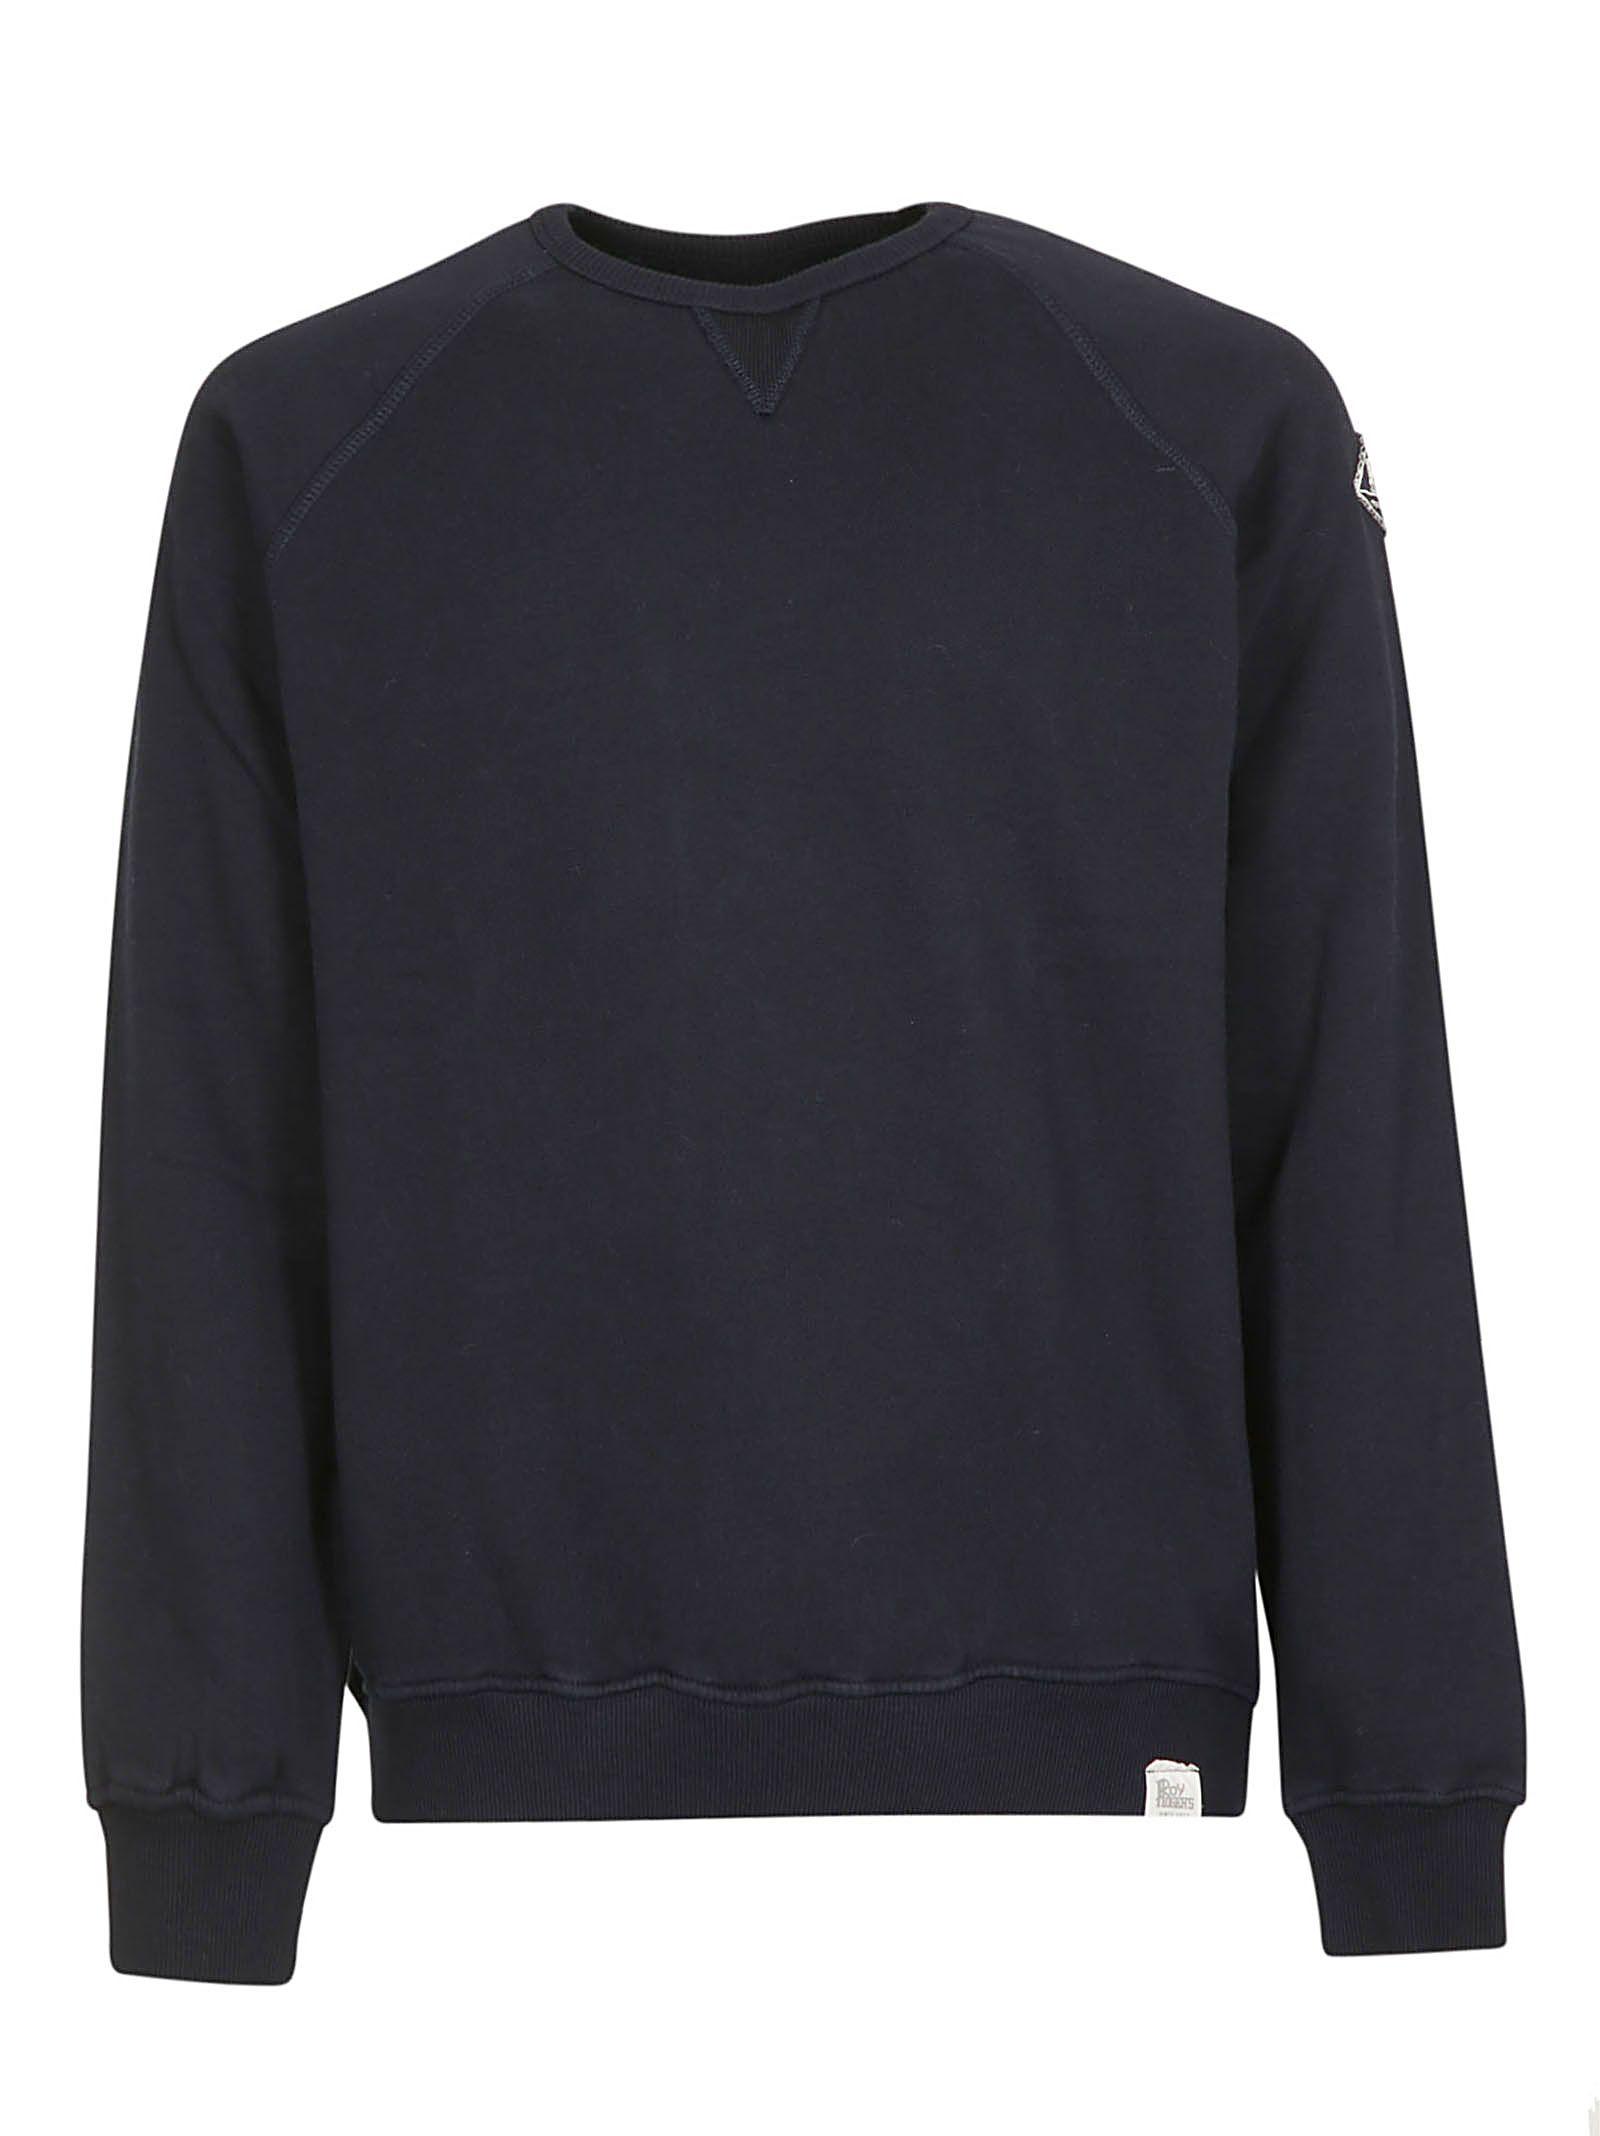 ROY ROGERS Classic Sweatshirt in Blue